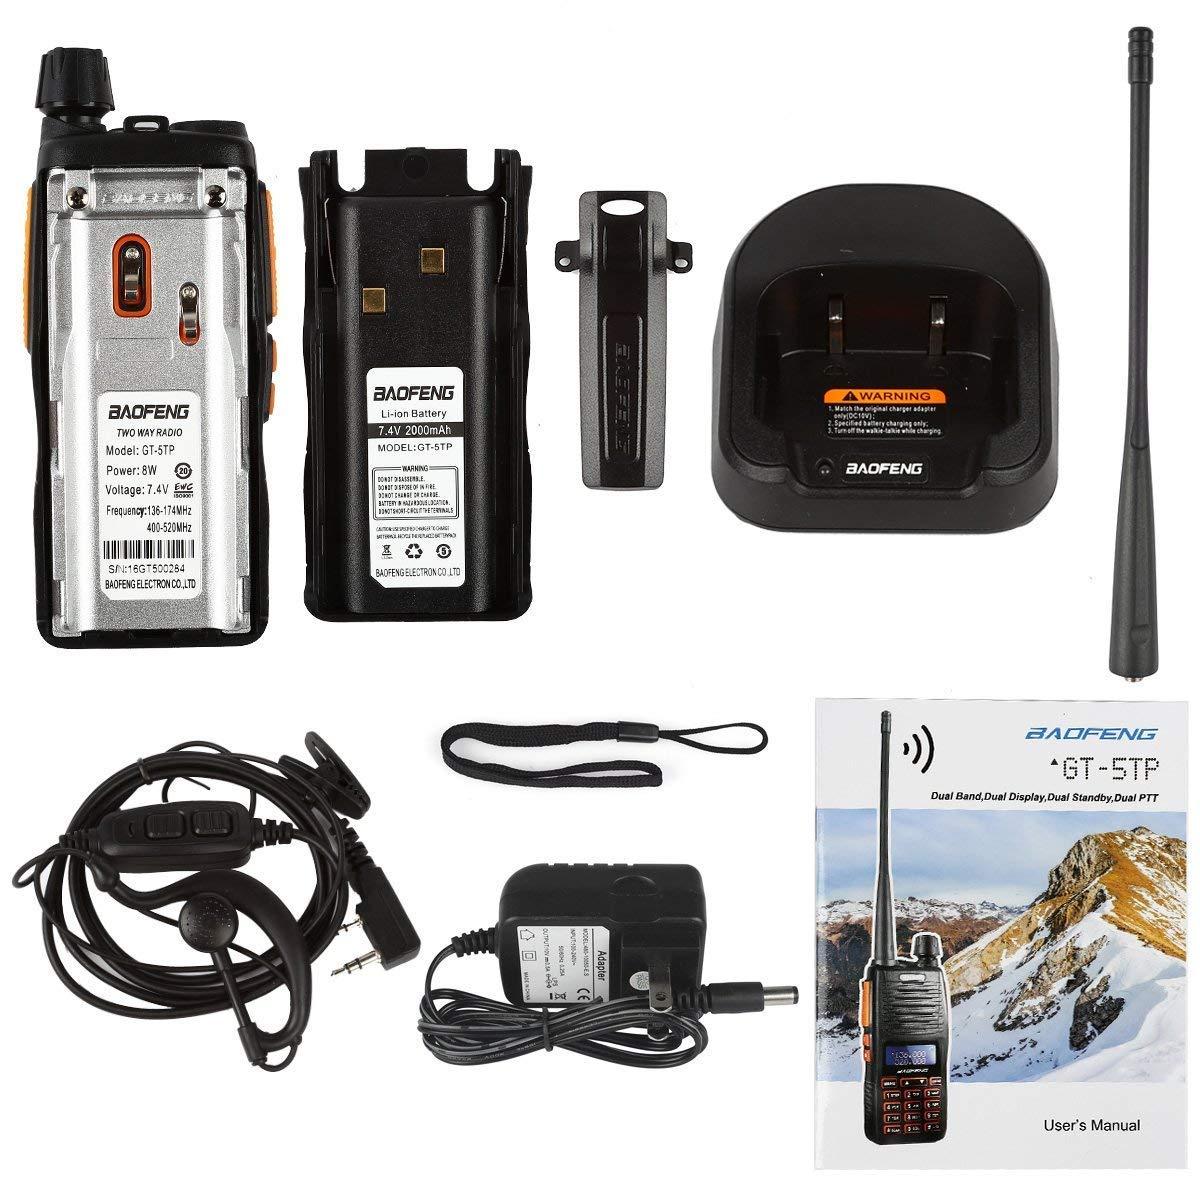 2000mAh Battery BaoFeng GT-5TP 8W//4W//1W Tri-Power UHF VHF Dual Band Amateur Ham Radio Handheld Two Way Radio Walkie Talkie with Earpiece Dual PTT